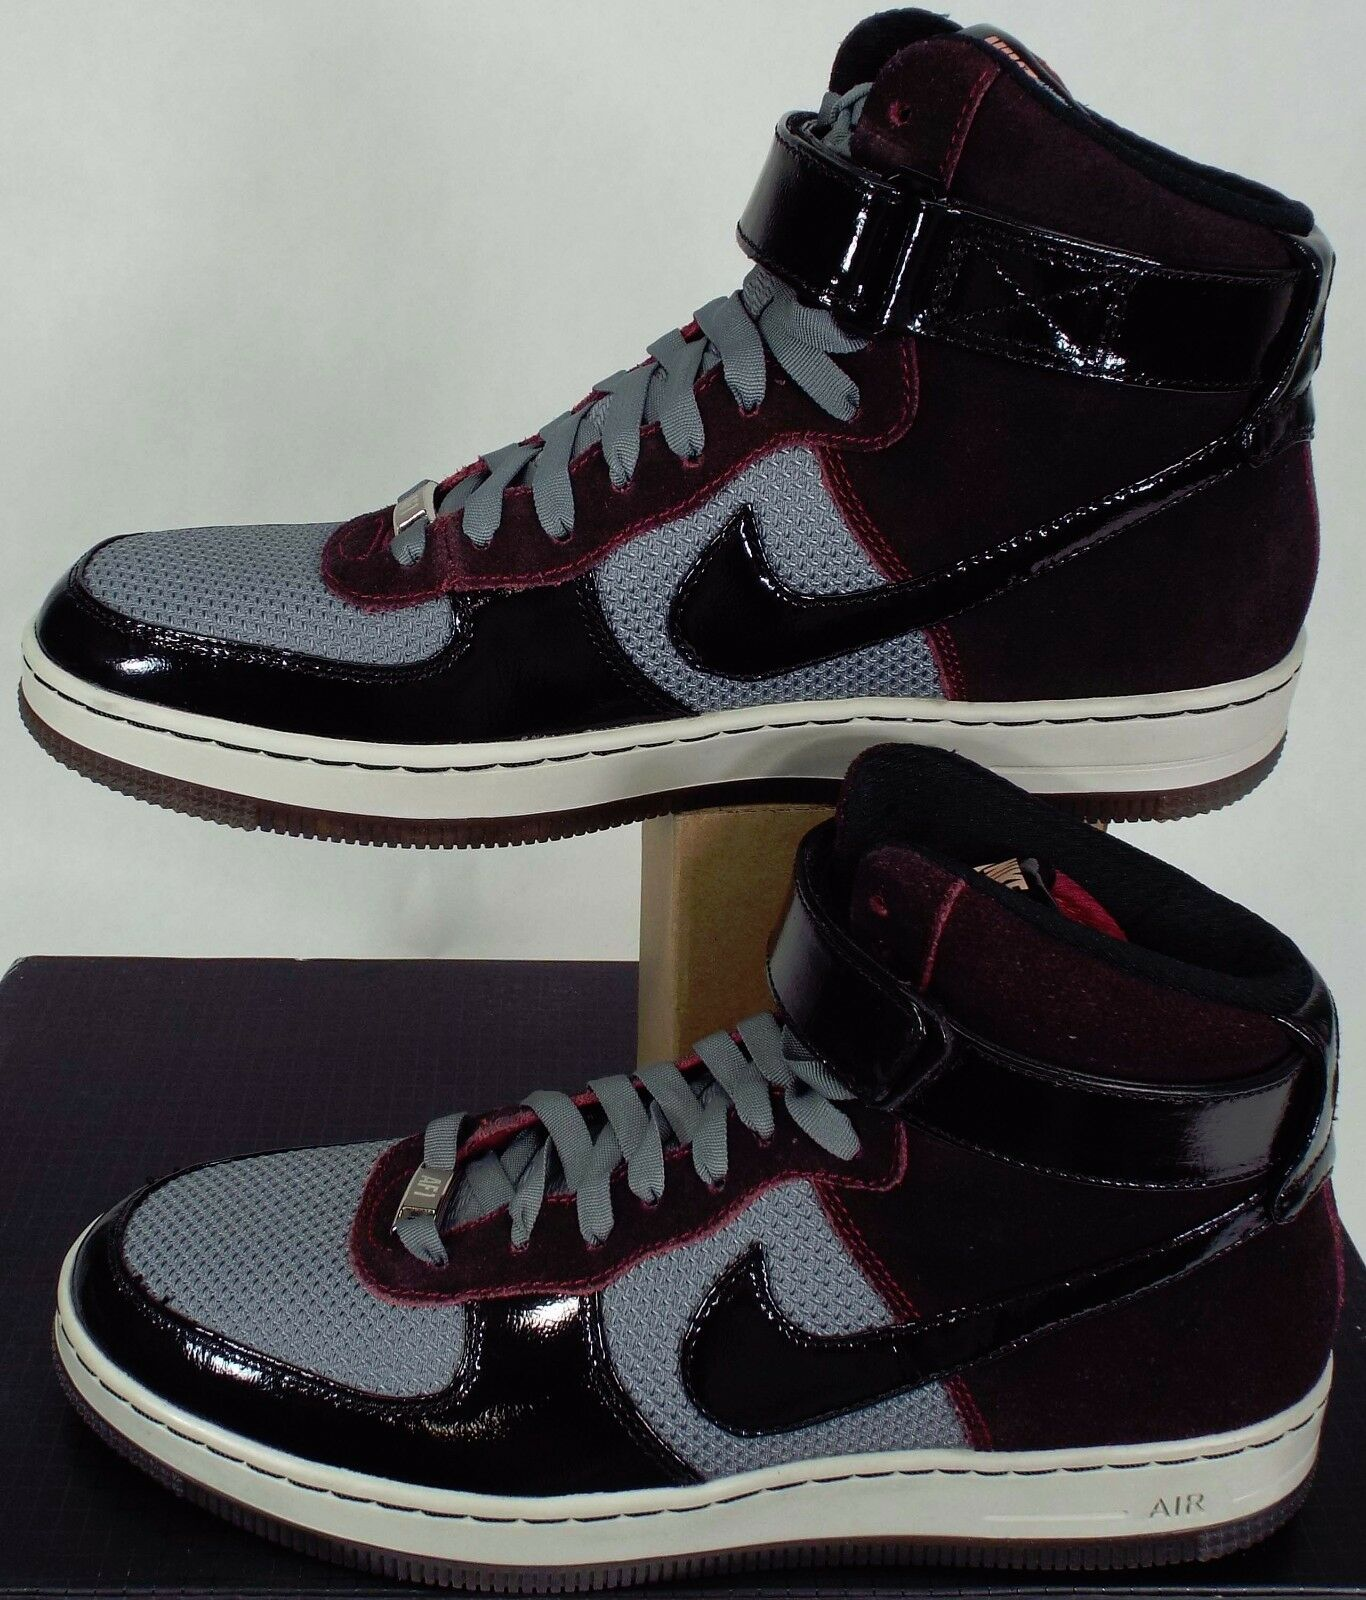 New Mens 9.5 NIKE AF1 Downtown HI Noble Red Black Fusion shoes  145 574887-600